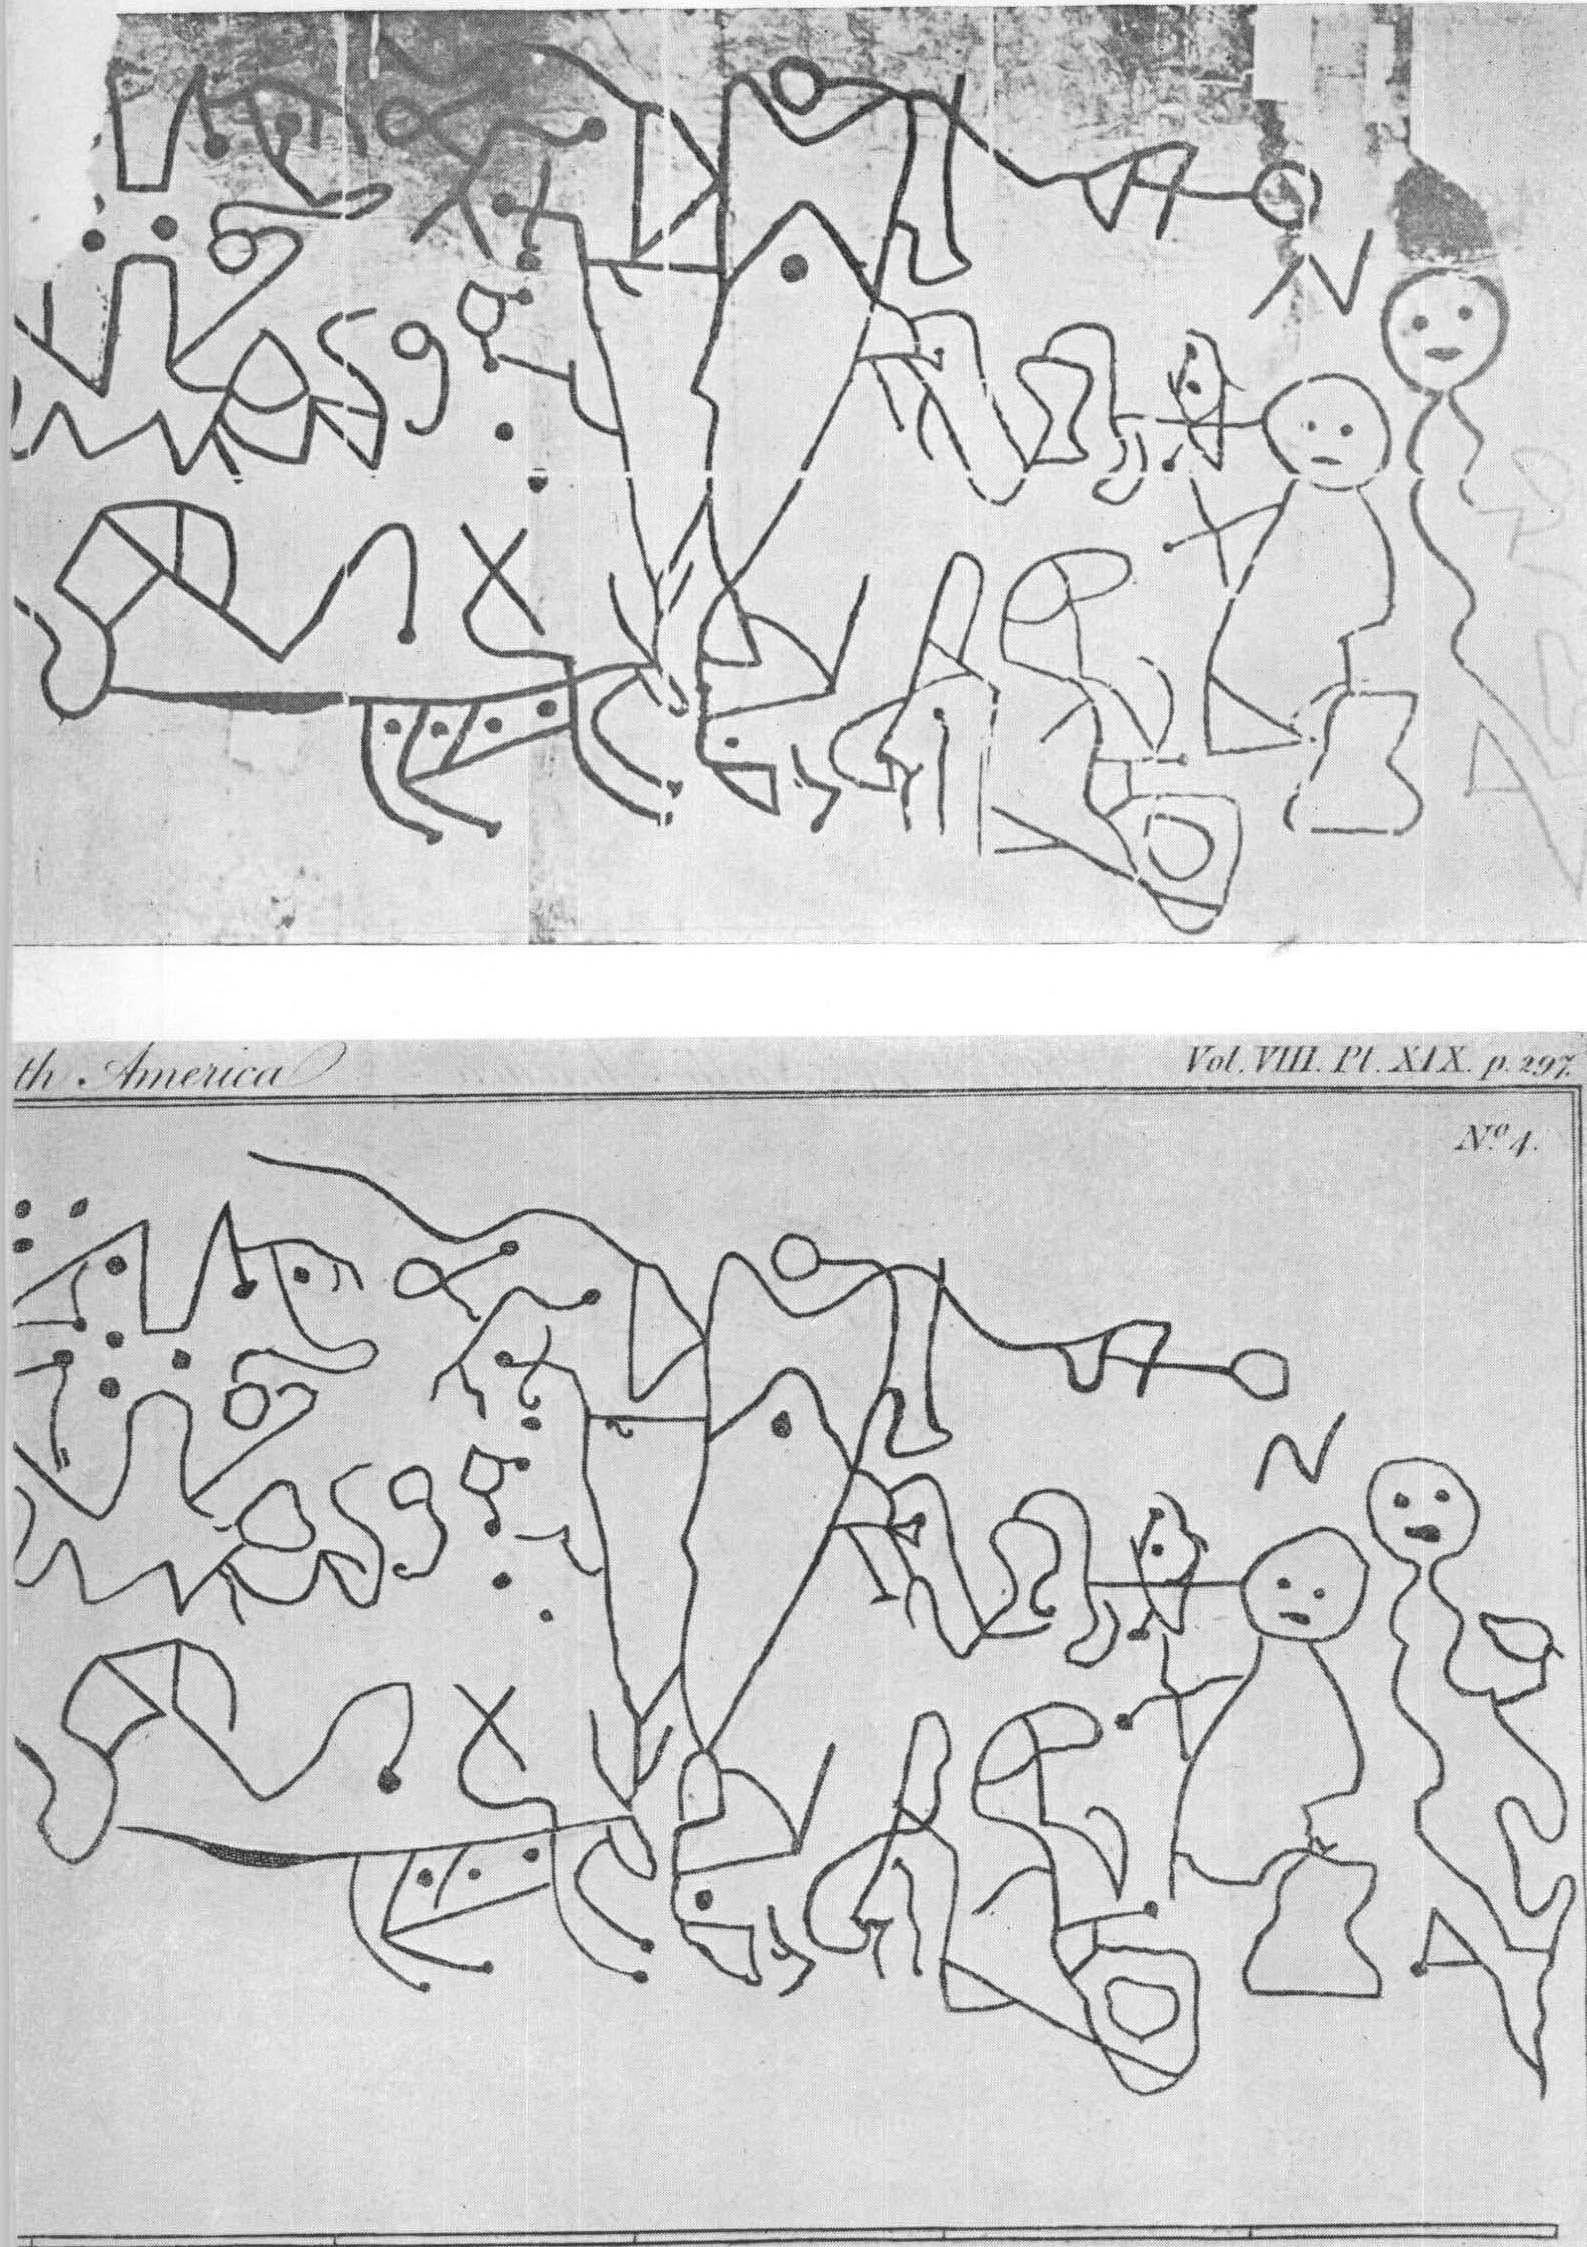 LORTu0027S REPRODUCTION OF SEWALLu0027S DRAWING, 1768